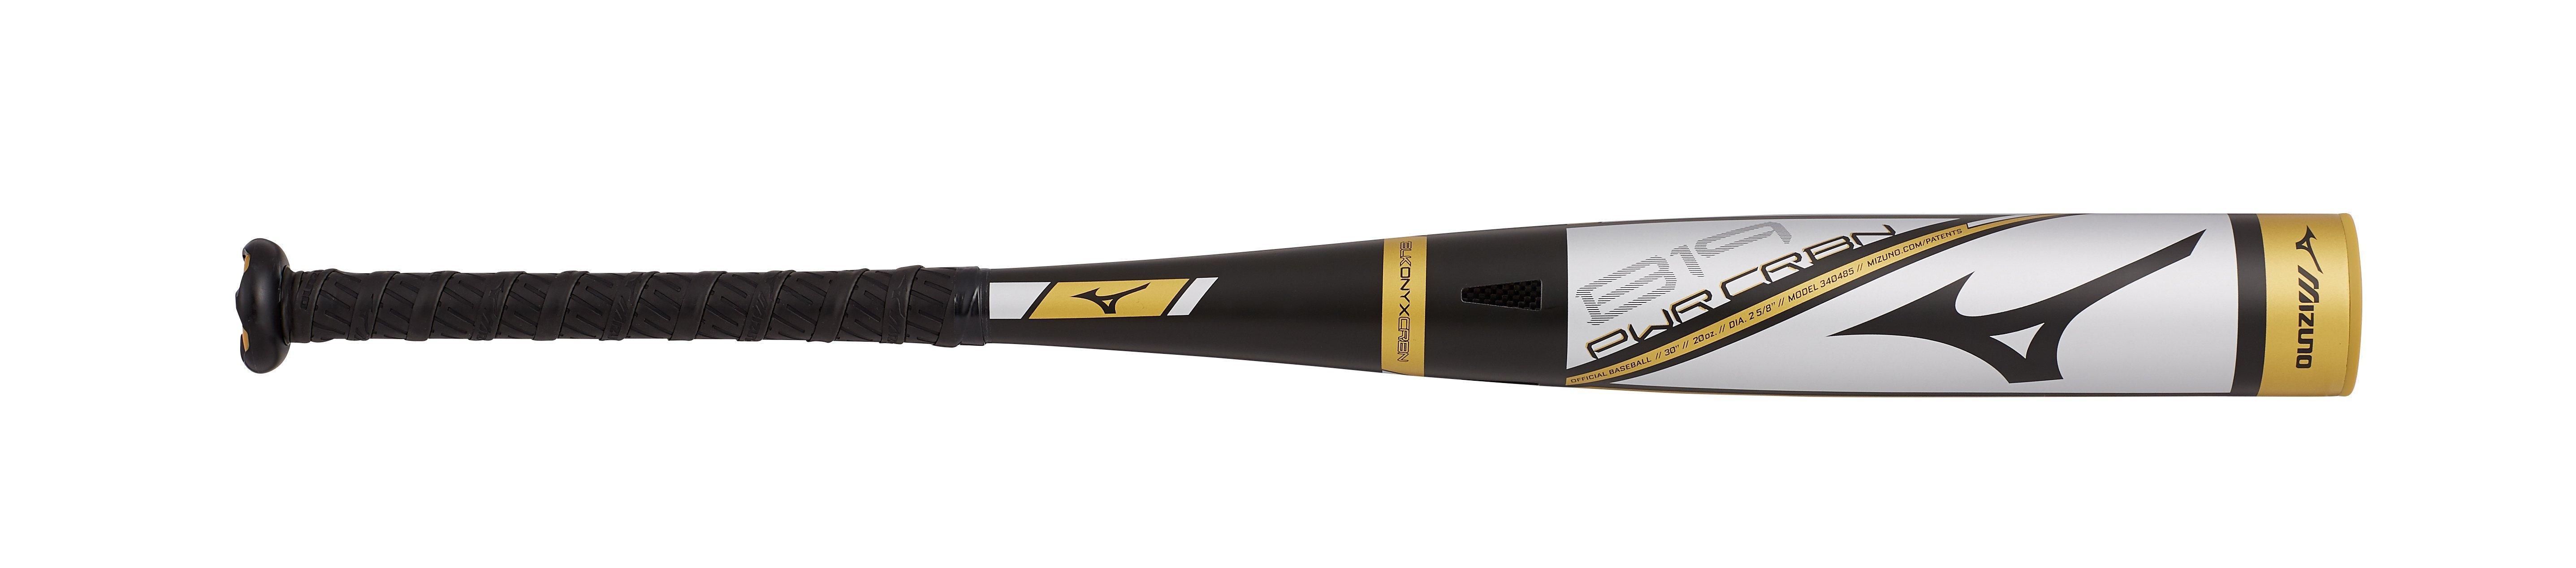 Mizuno B19-Pwr Crbn - Big Barrel Youth Usa Baseball Bat